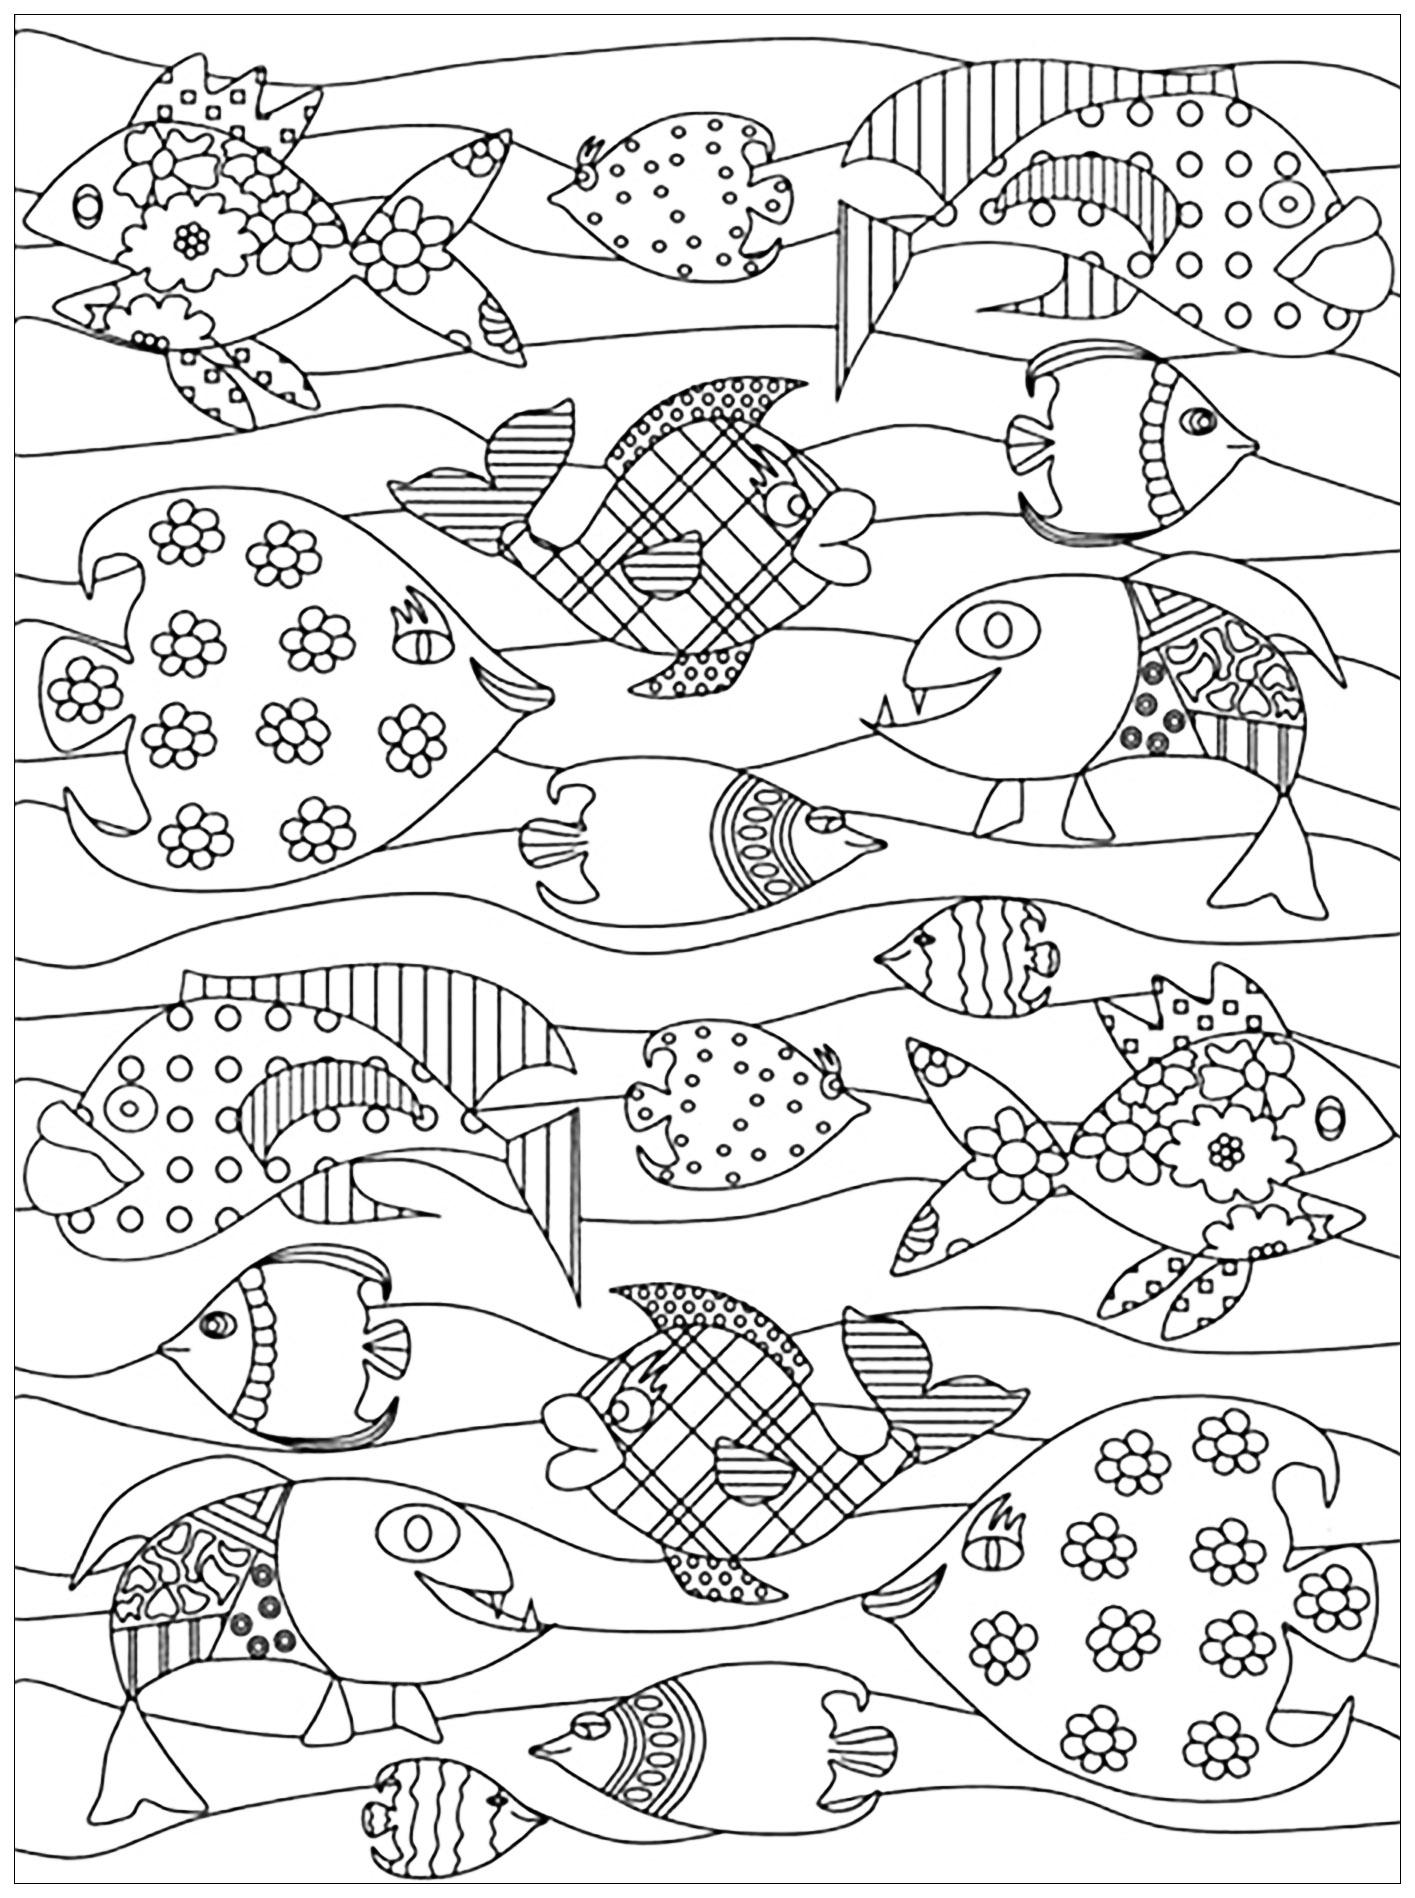 Colorear para adultos  : Peces - 9